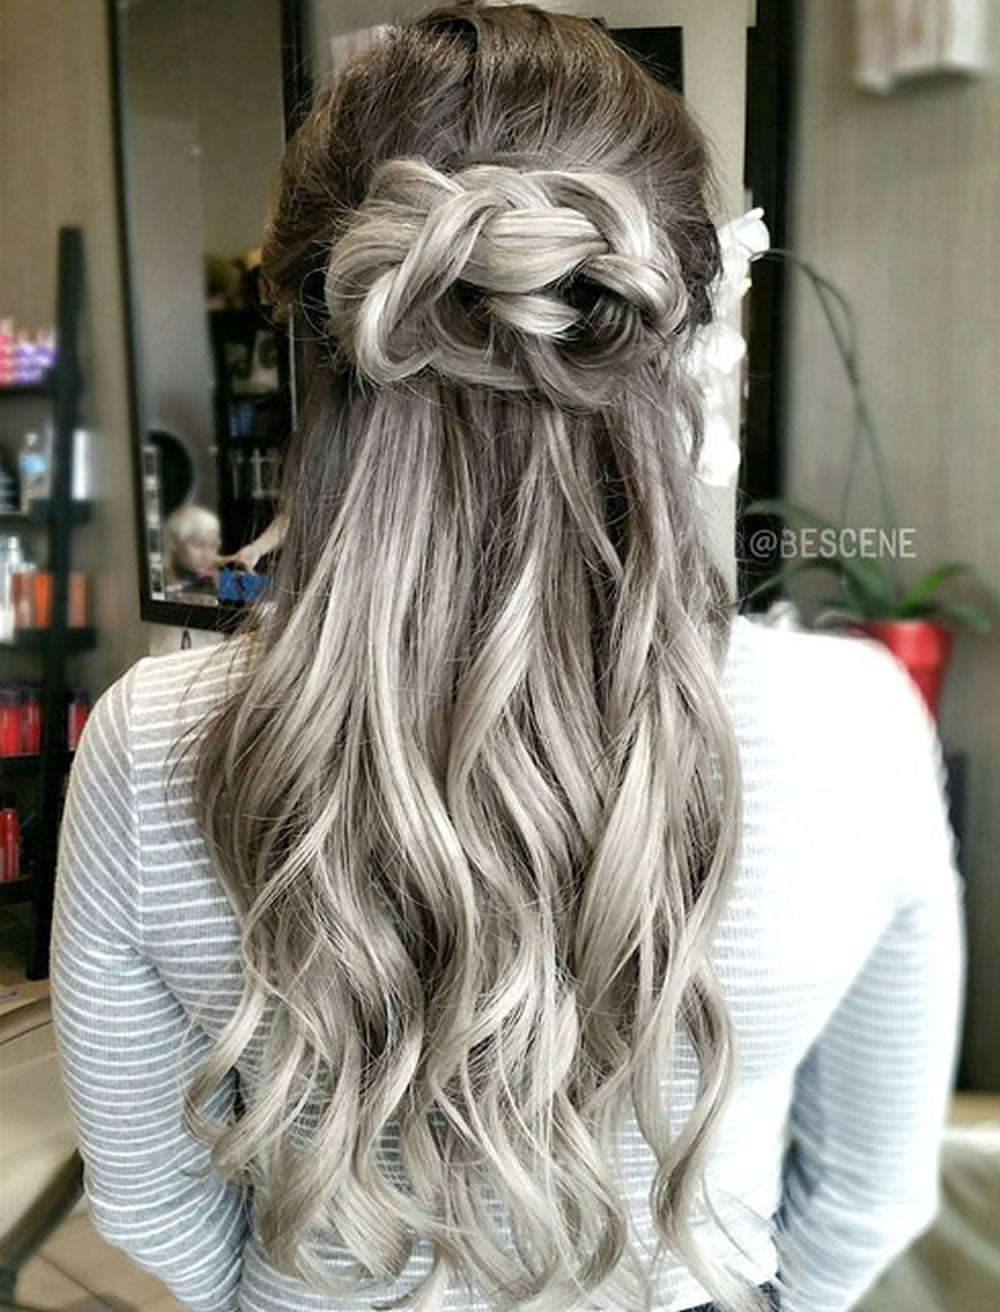 Grey Hair Trend – 20 Glamorous Hairstyles for Women 2018 ...